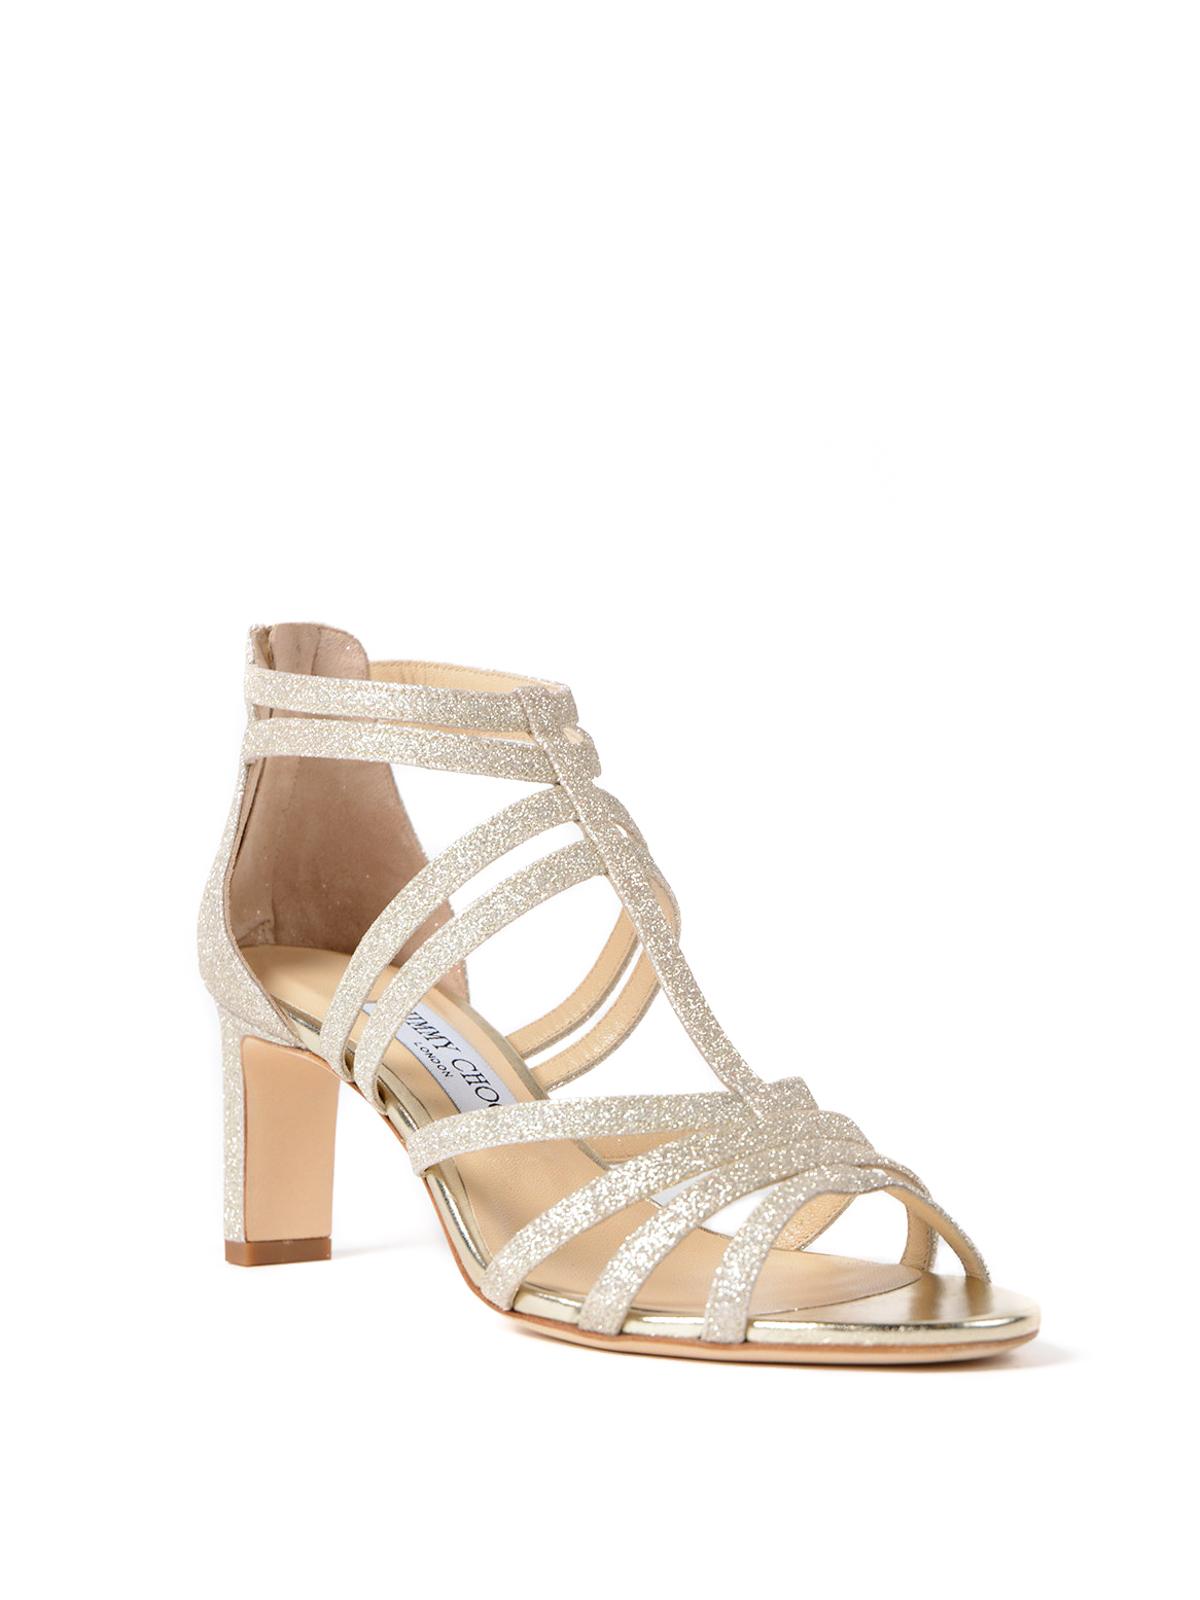 cf4af5dfac0 Jimmy Choo - Selina 65 dusty glitter sandals - sandals - SELINA65DGZ